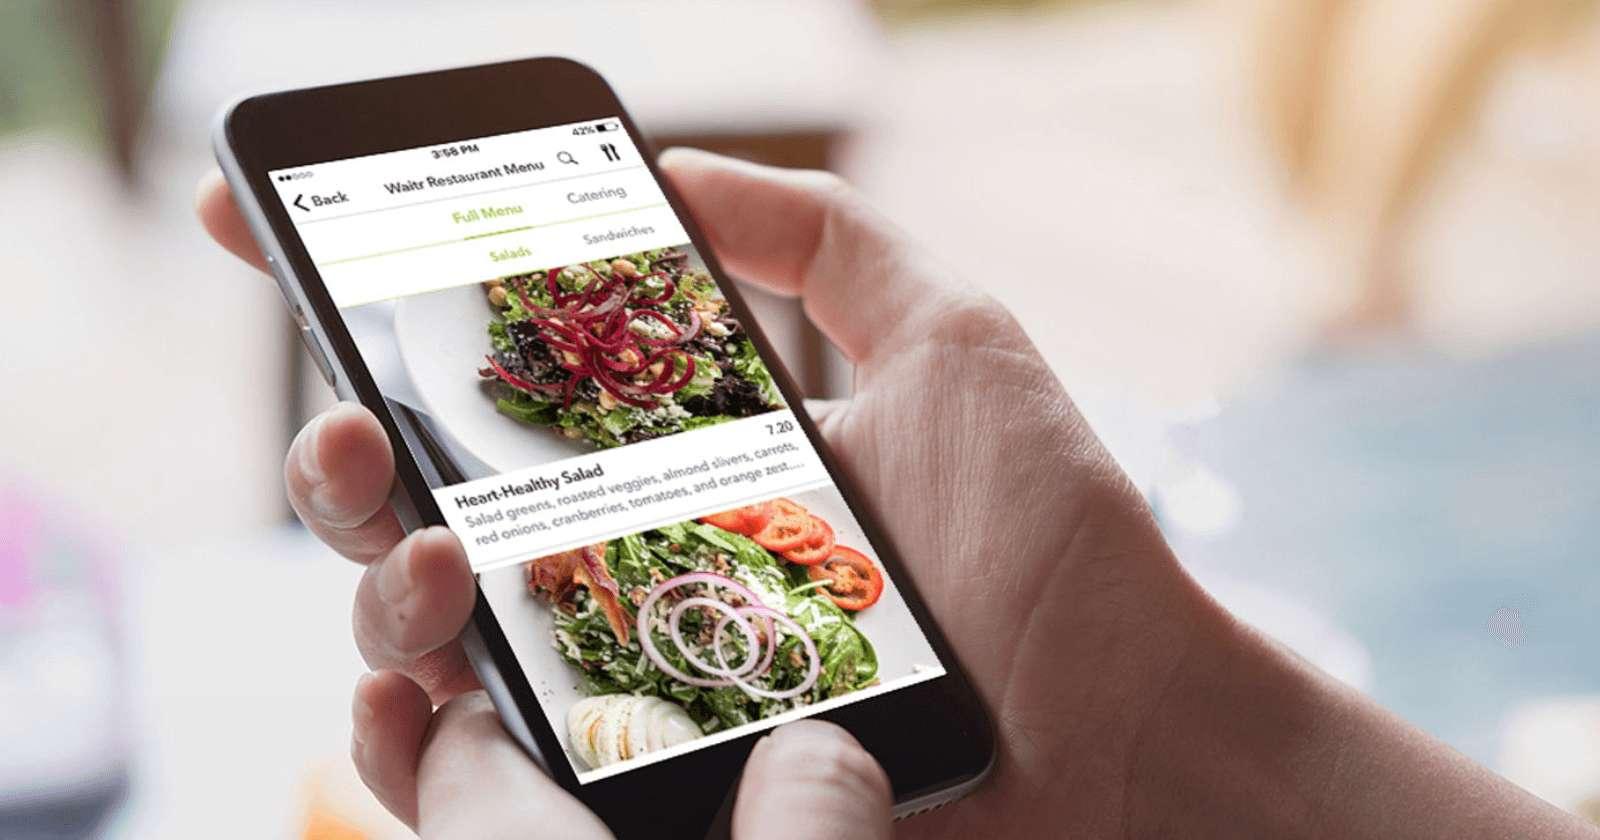 Key things to consider before ordering food online.